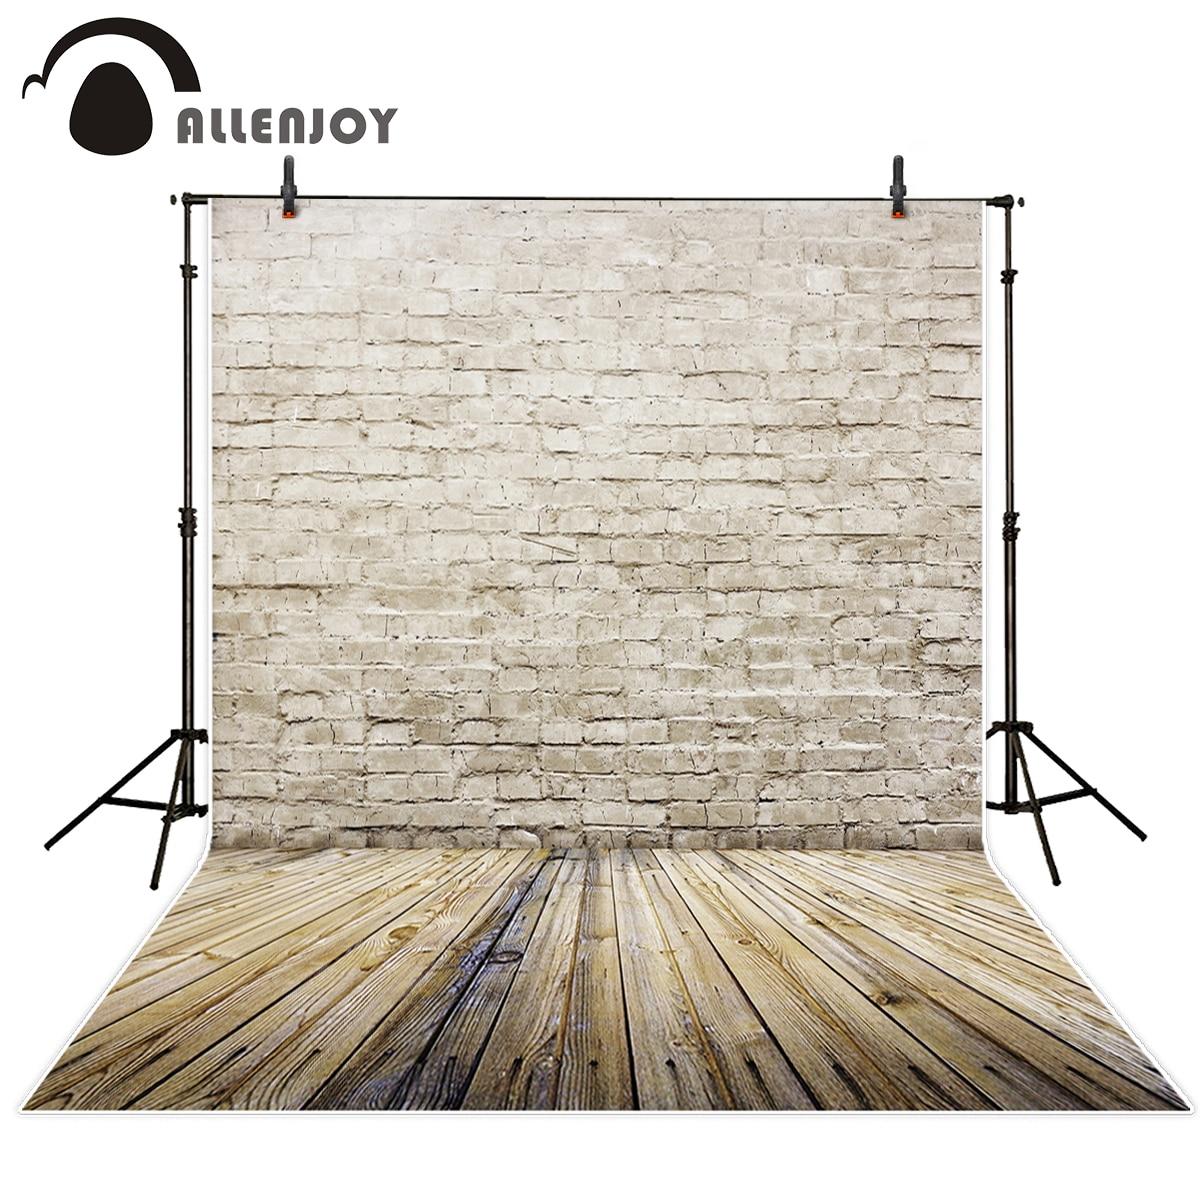 Allenjoy Brick wall Wood Gray distressed vintage Brick wall Photographic background vinyl photography backdrops photo studio